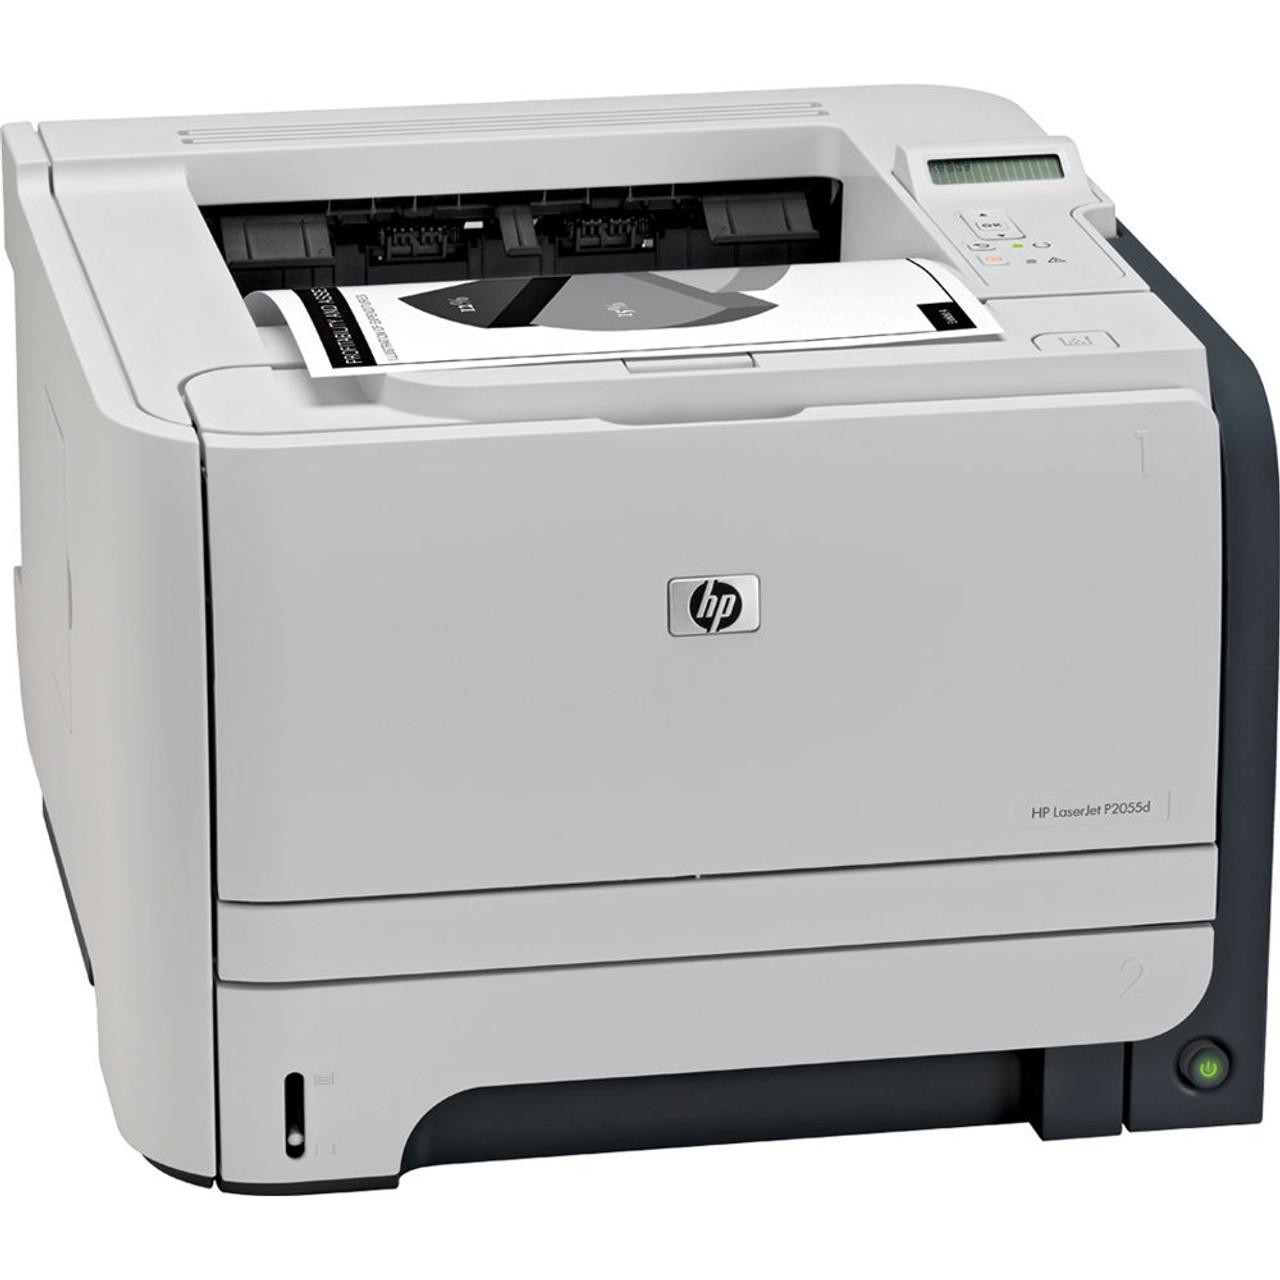 HP Laserjet P2055D - CE457A - 2035 HP Printer for sale